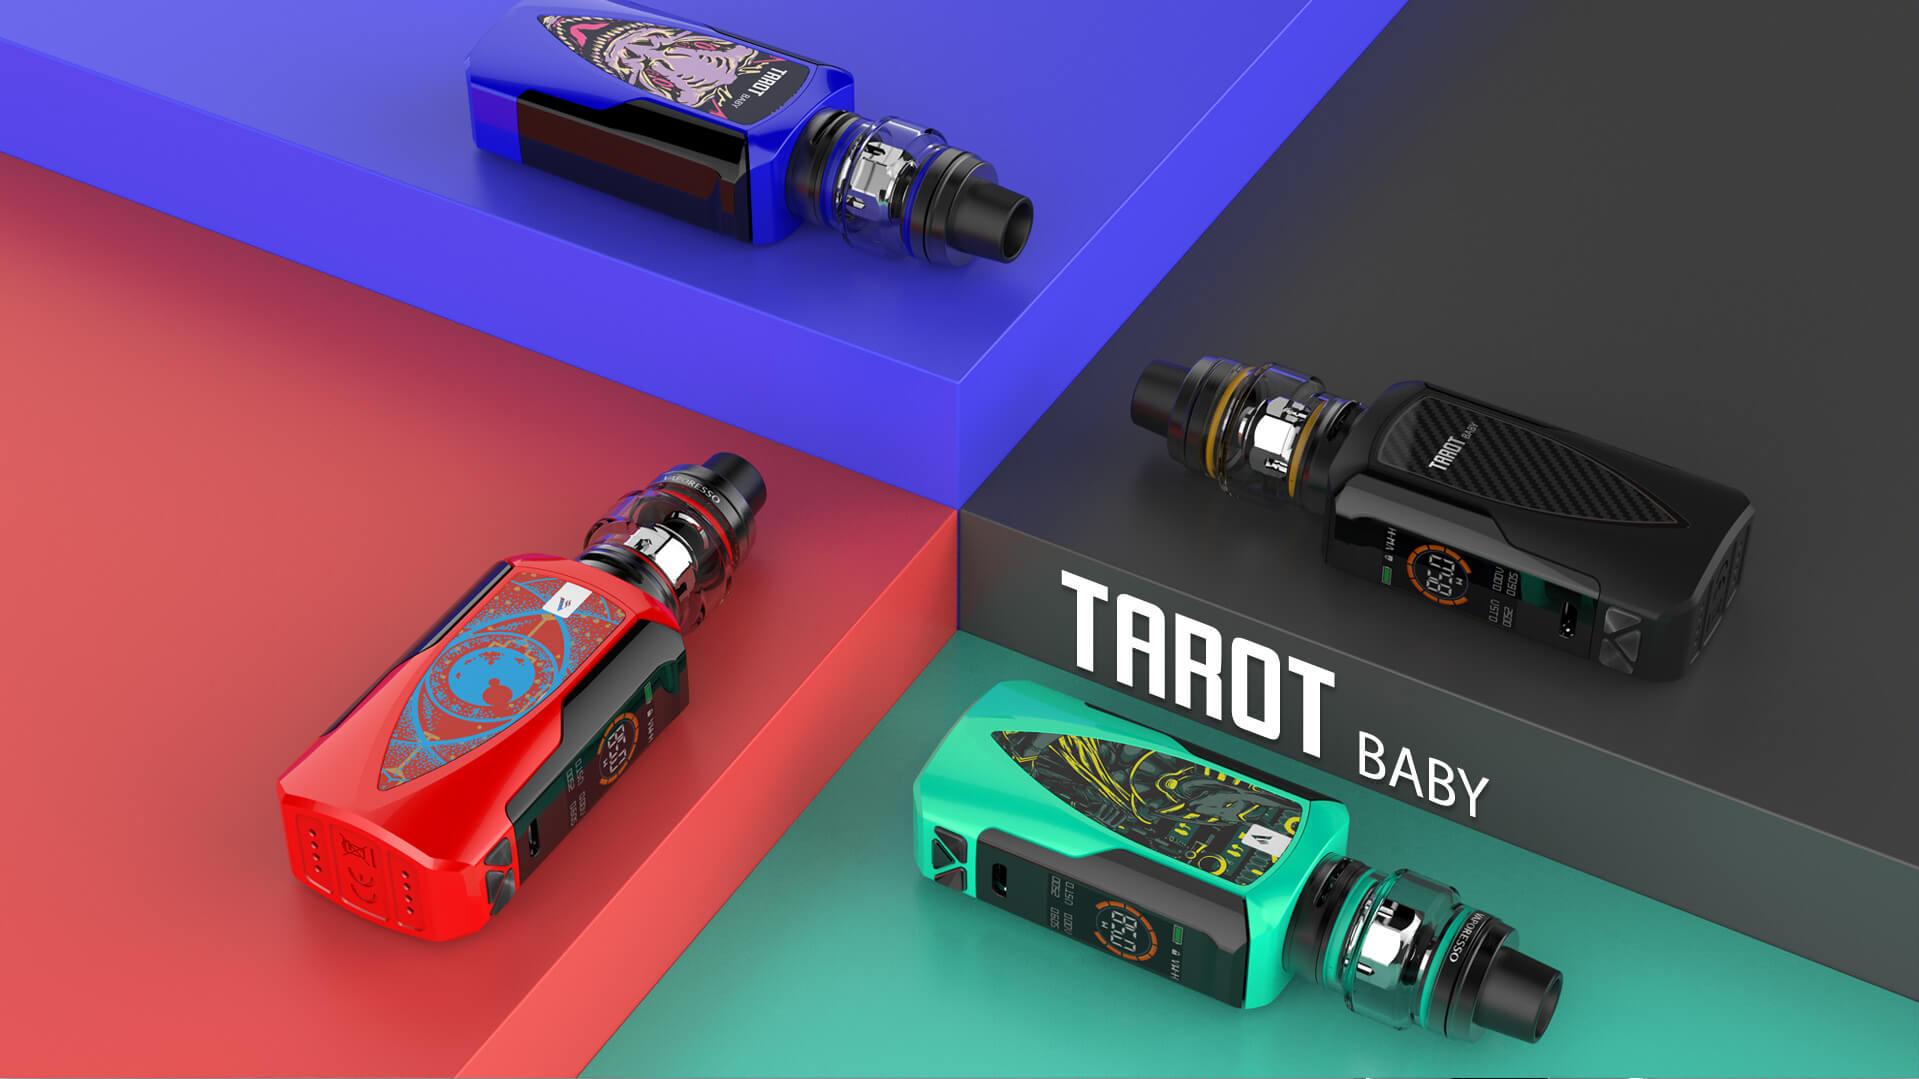 https://www.vaporesso.com/hs-fs/hubfs/img/Site/Products/Tarot_baby/Tarot_baby_1.jpg?t=1537957810364&width=1919&name=Tarot_baby_1.jpg